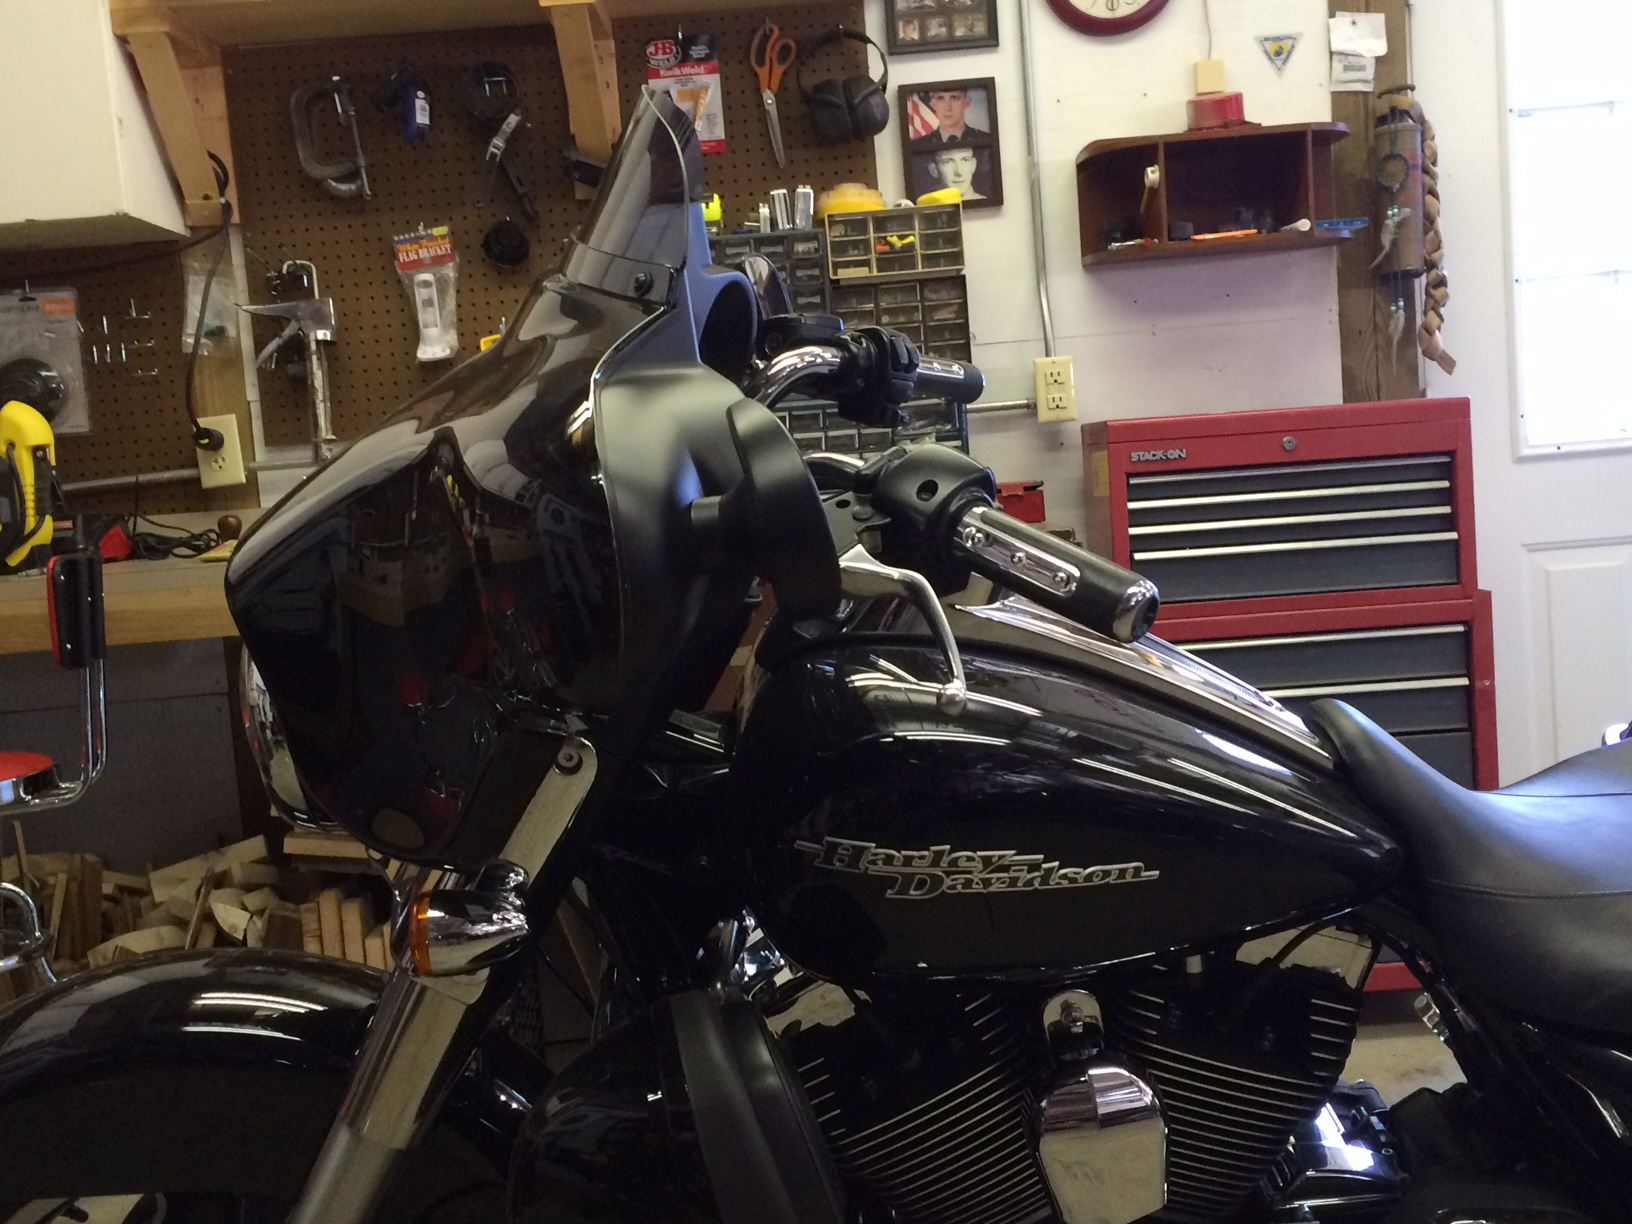 Kevin's 2013 Street Glide 14 inch Handlebar Install - Ride